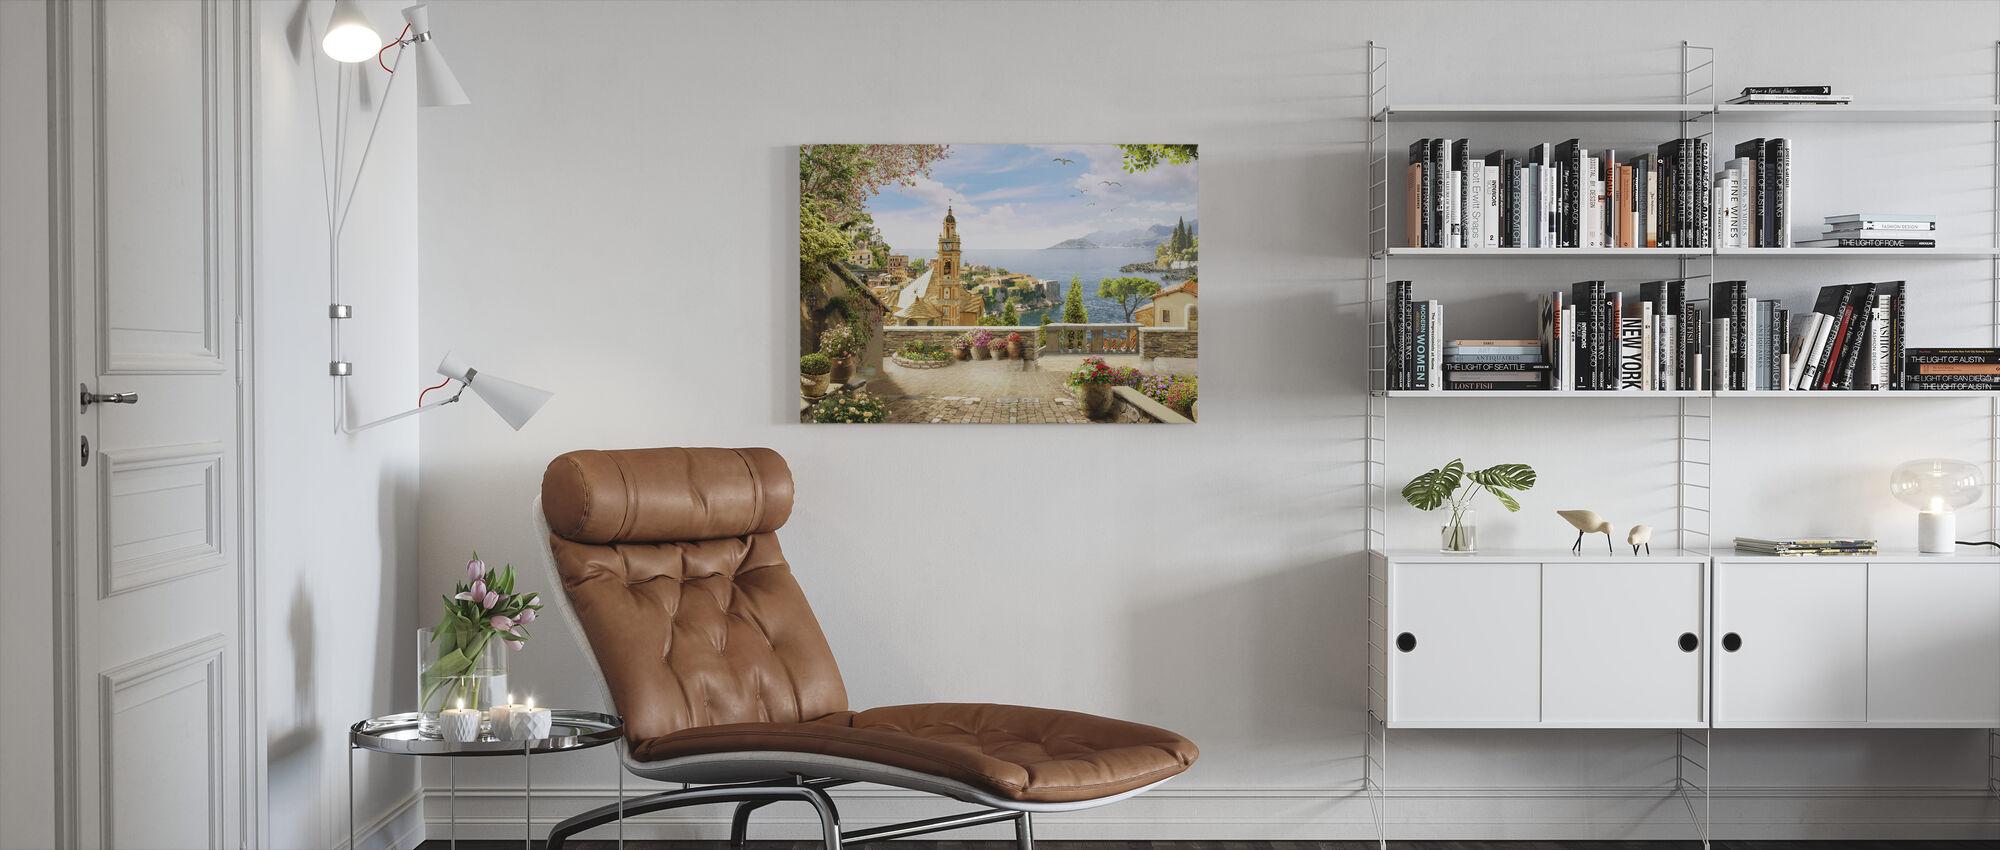 Stunning View of Amalfi - Canvas print - Living Room